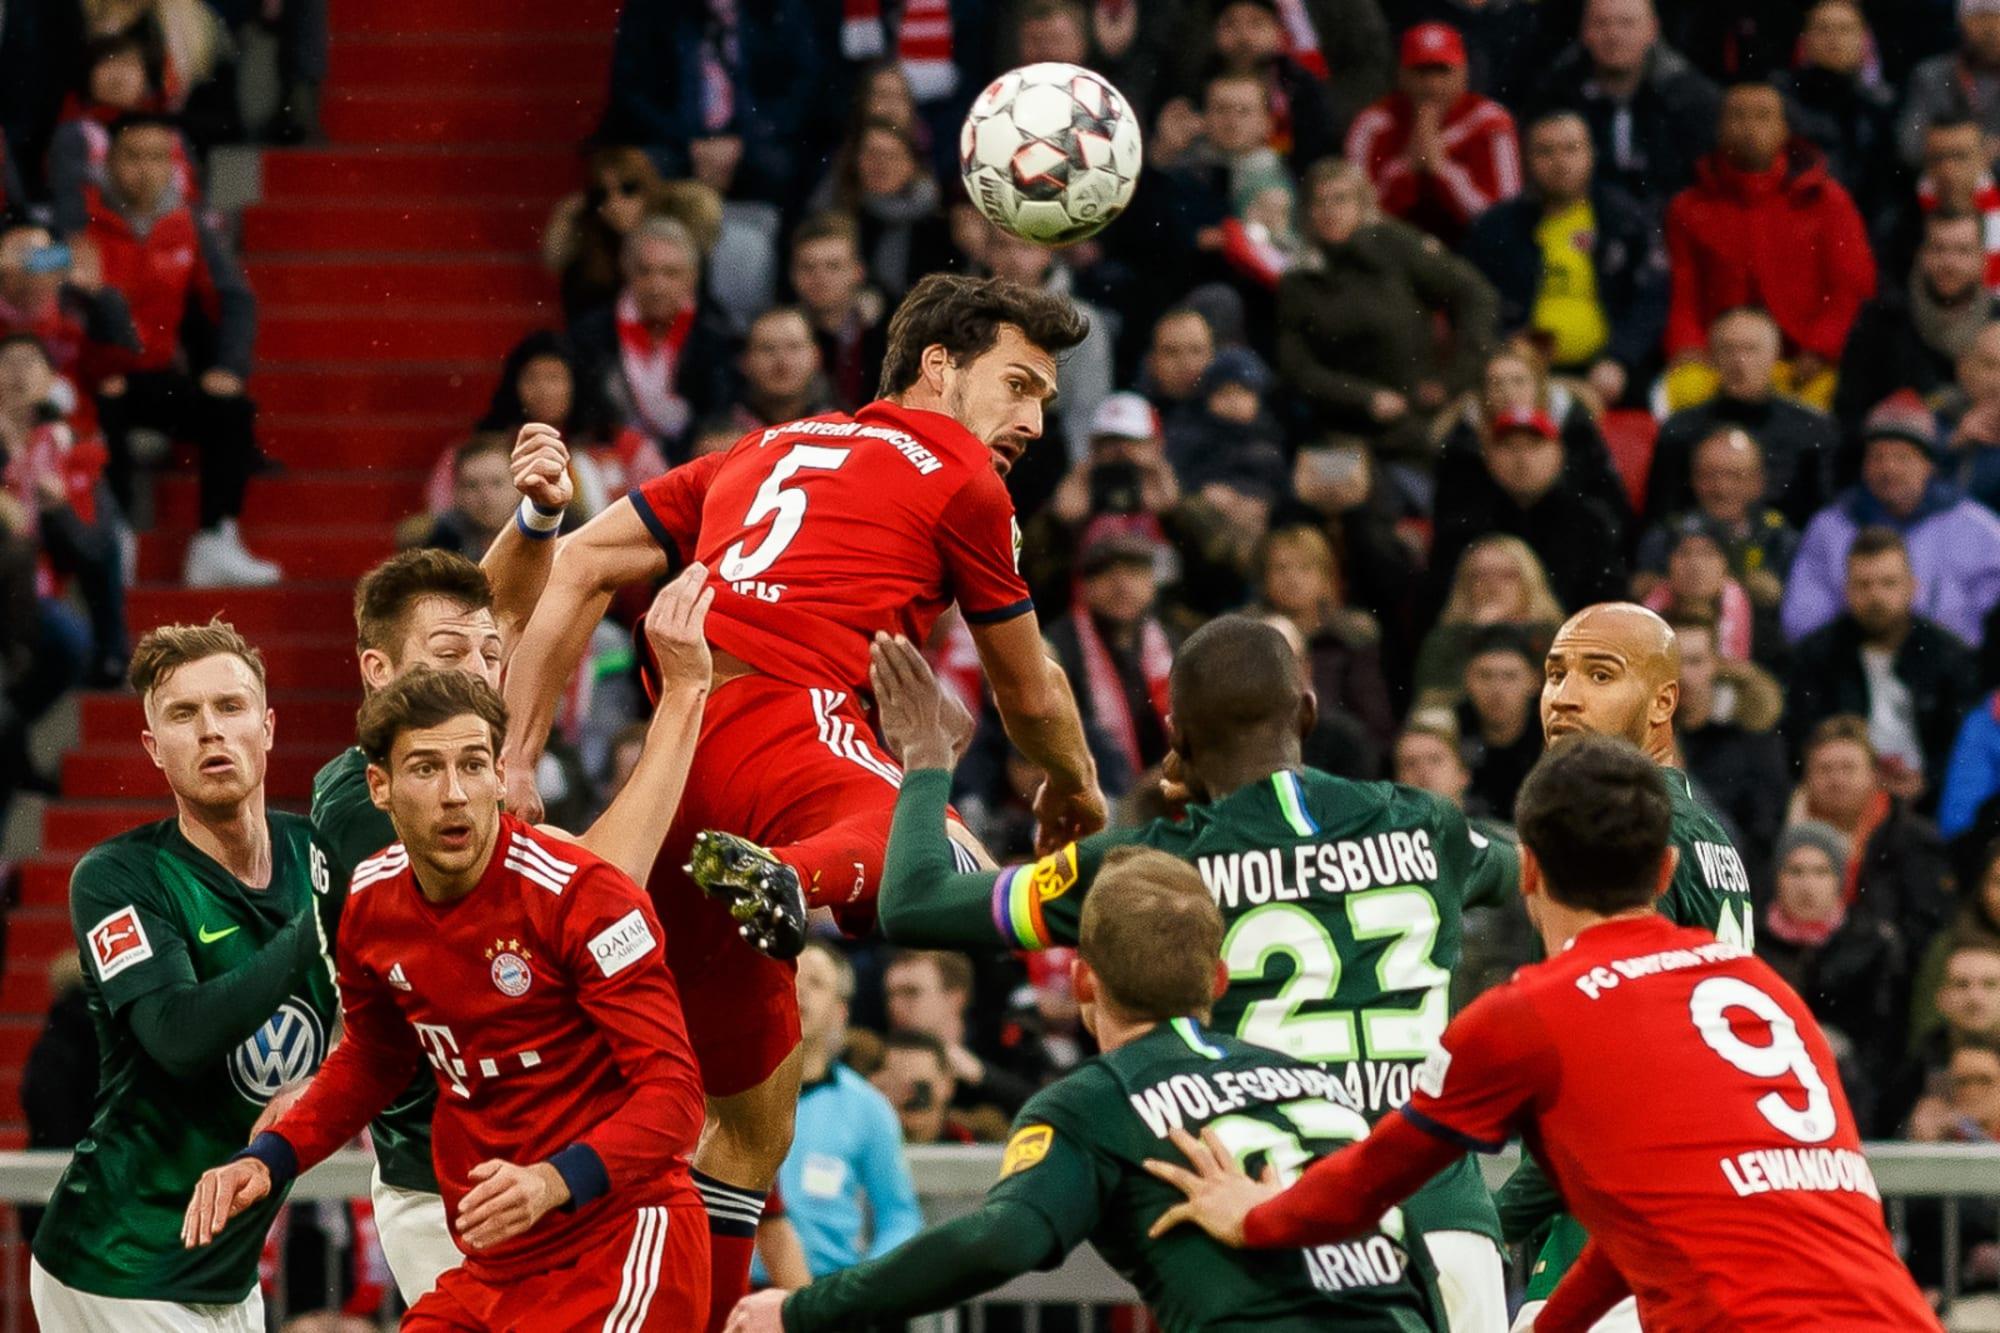 Bayern Vs Wolfsburg